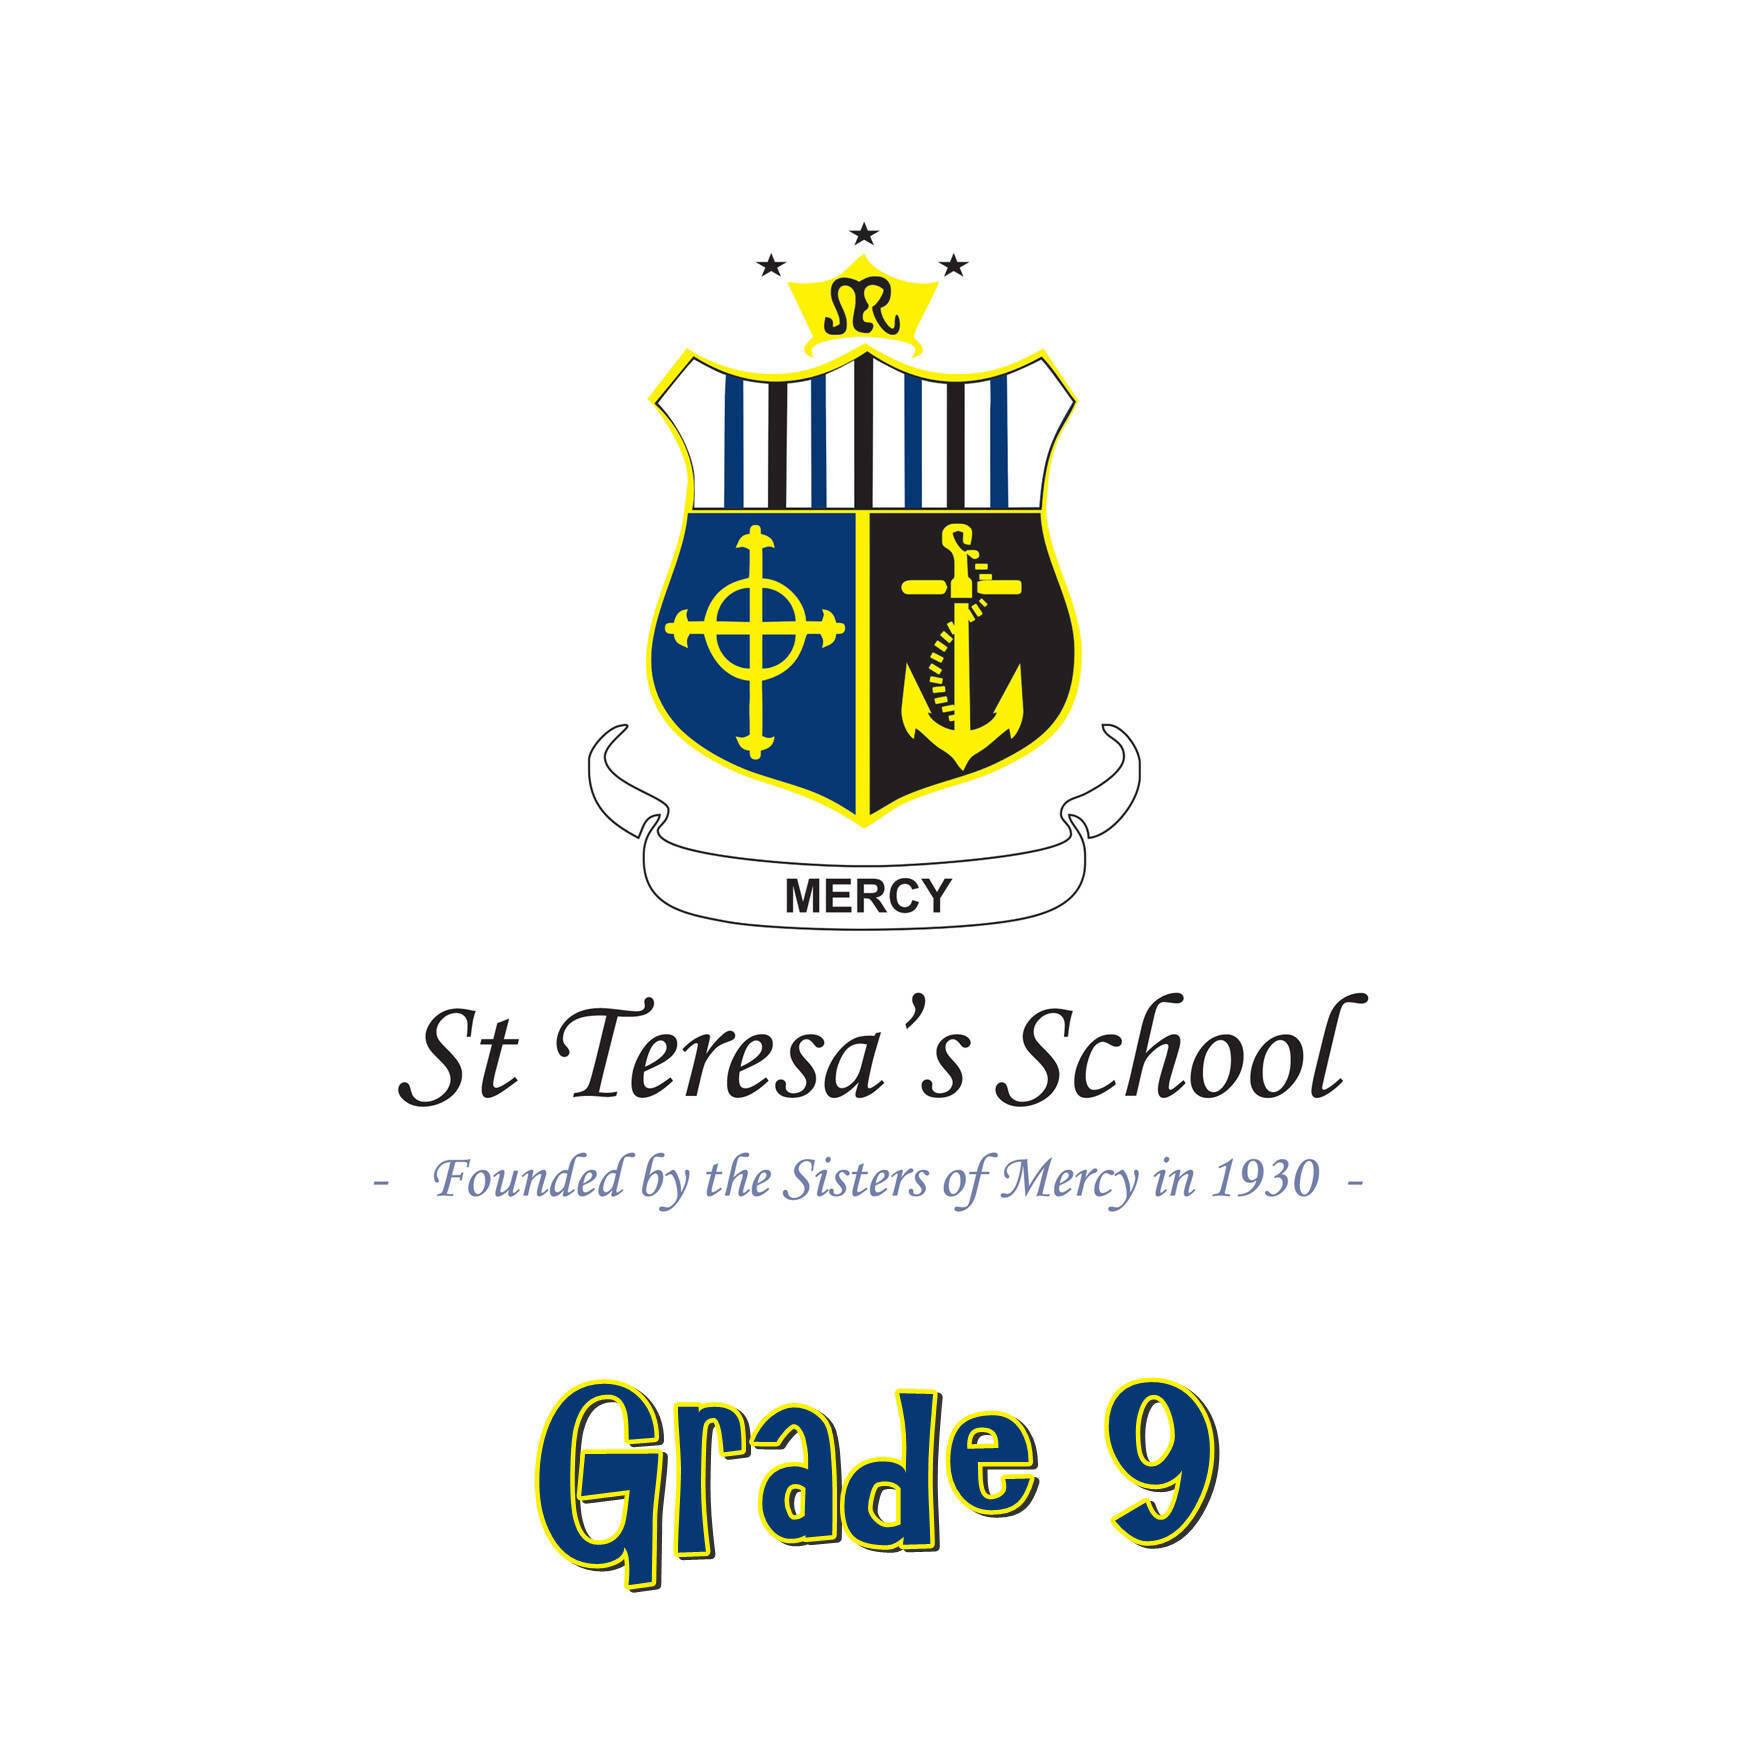 St Teresa's School Grade 9